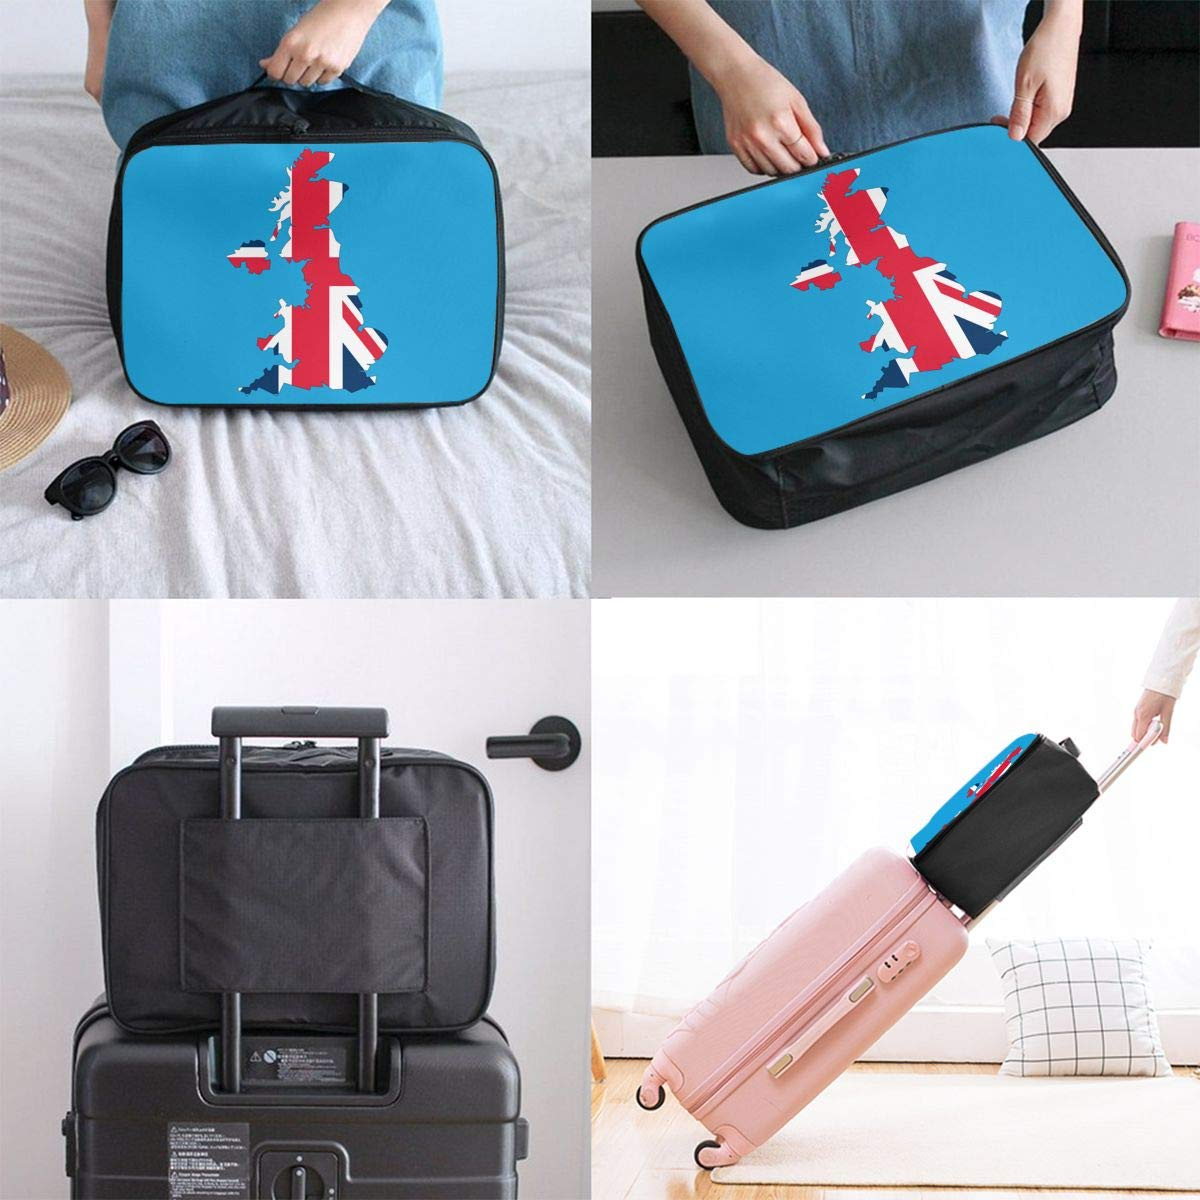 YueLJB UK British Flag Map Lightweight Large Capacity Portable Luggage Bag Travel Duffel Bag Storage Carry Luggage Duffle Tote Bag